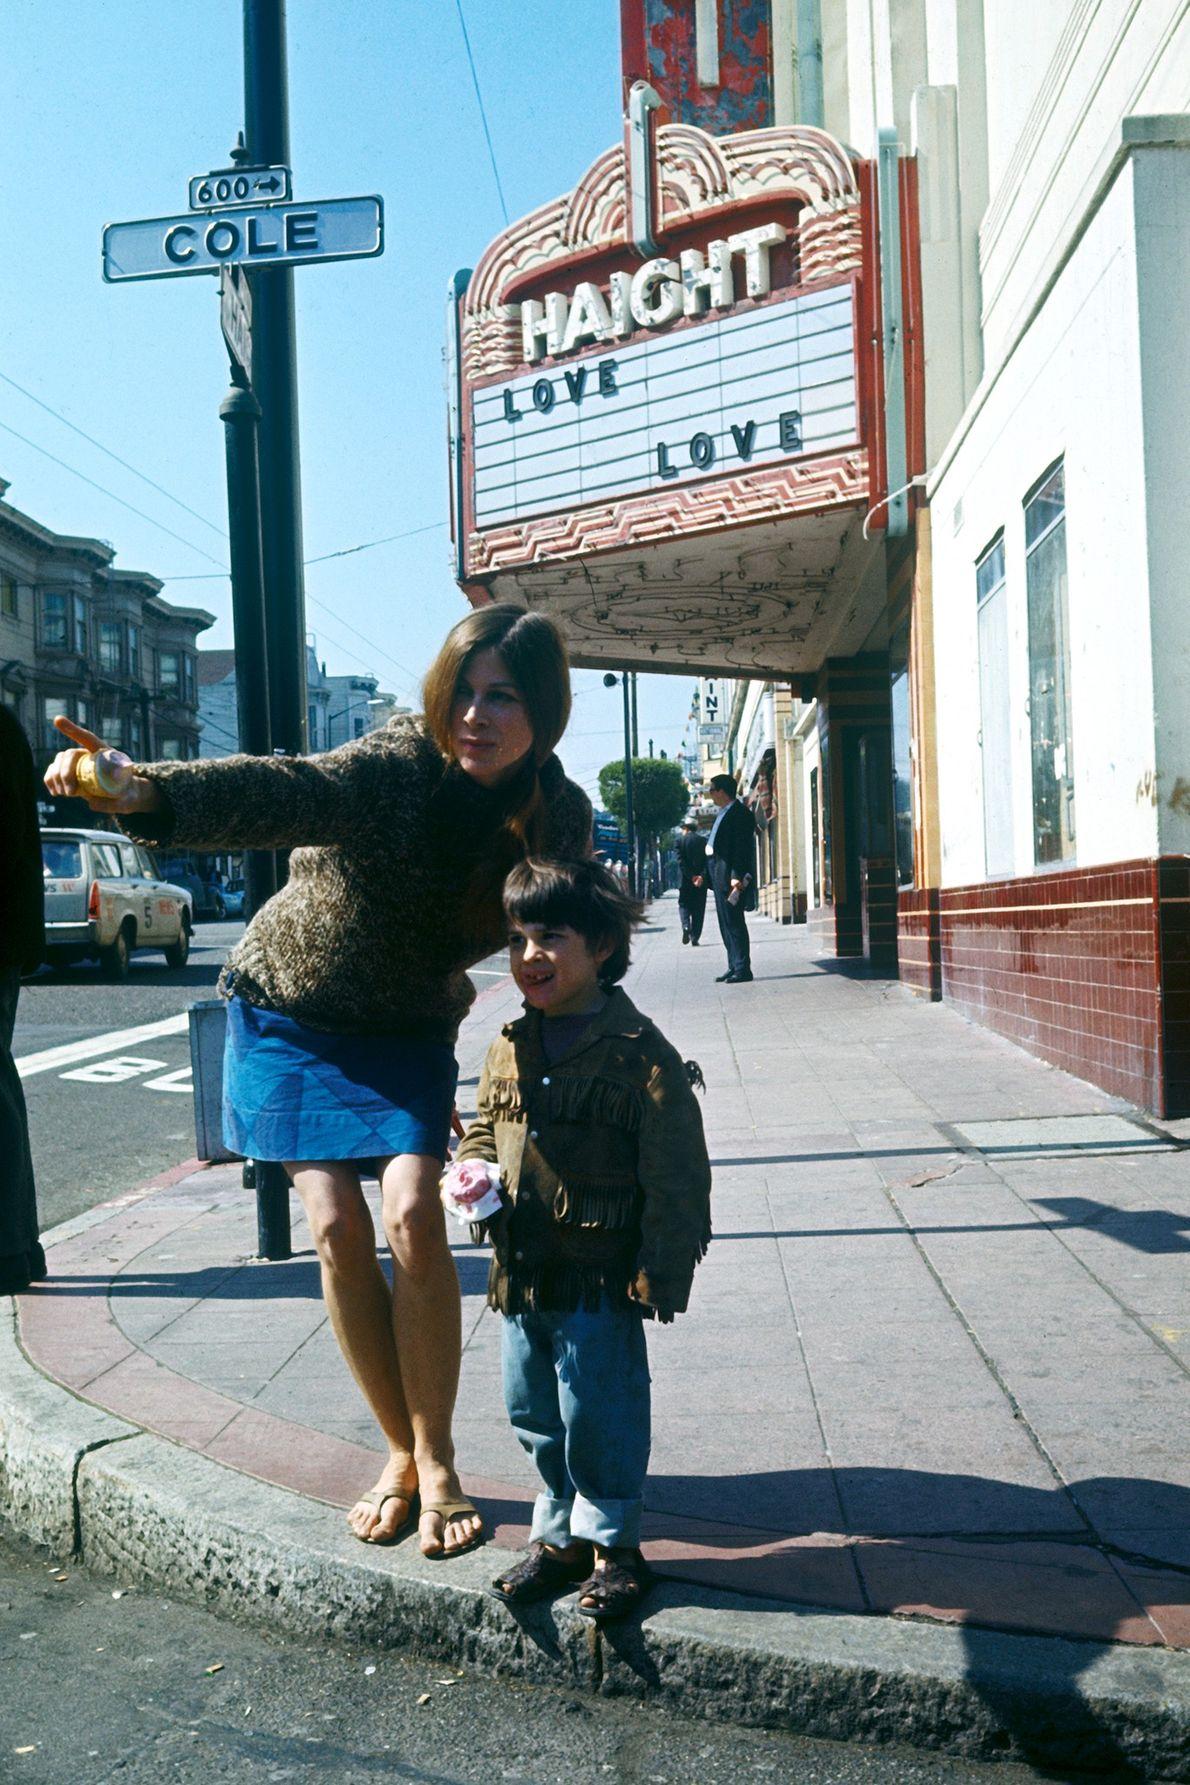 Kino in Haight-Ashbury